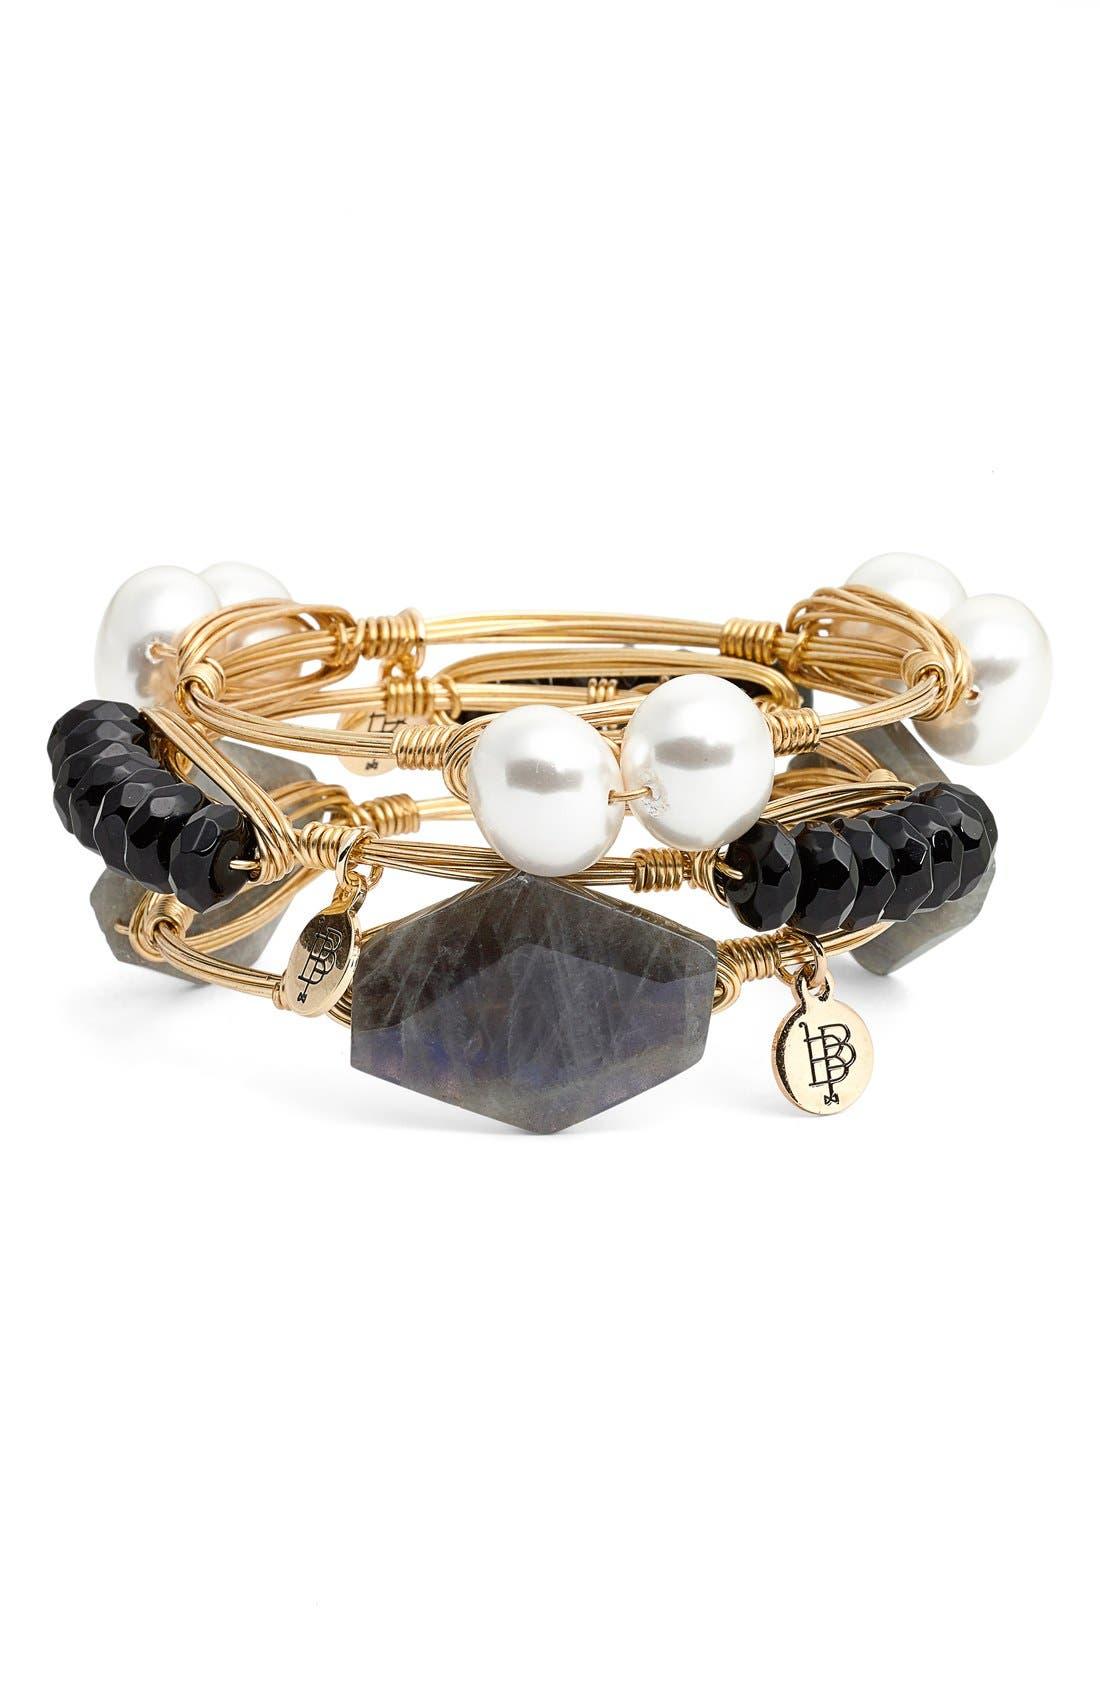 Main Image - Bourbon & Boweties Black & Labradorite Stone Bracelets (Set of 3)